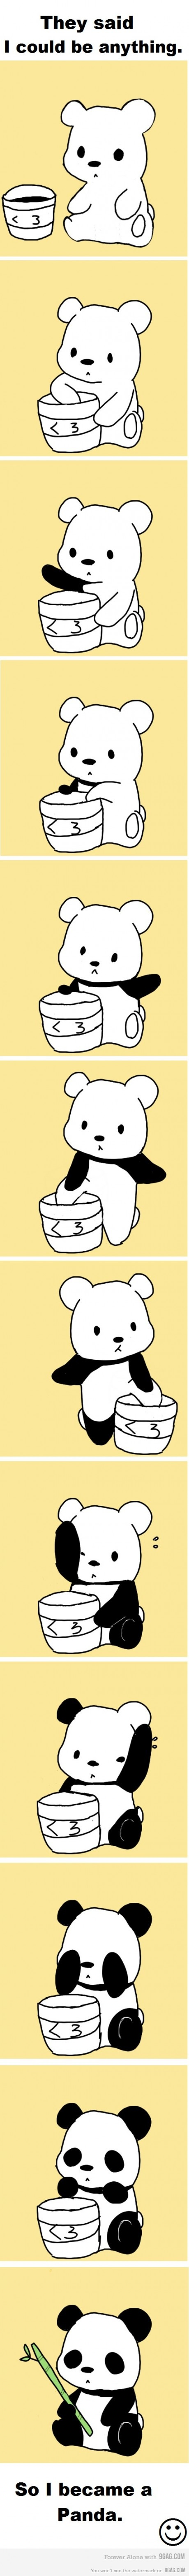 i am a panda now.